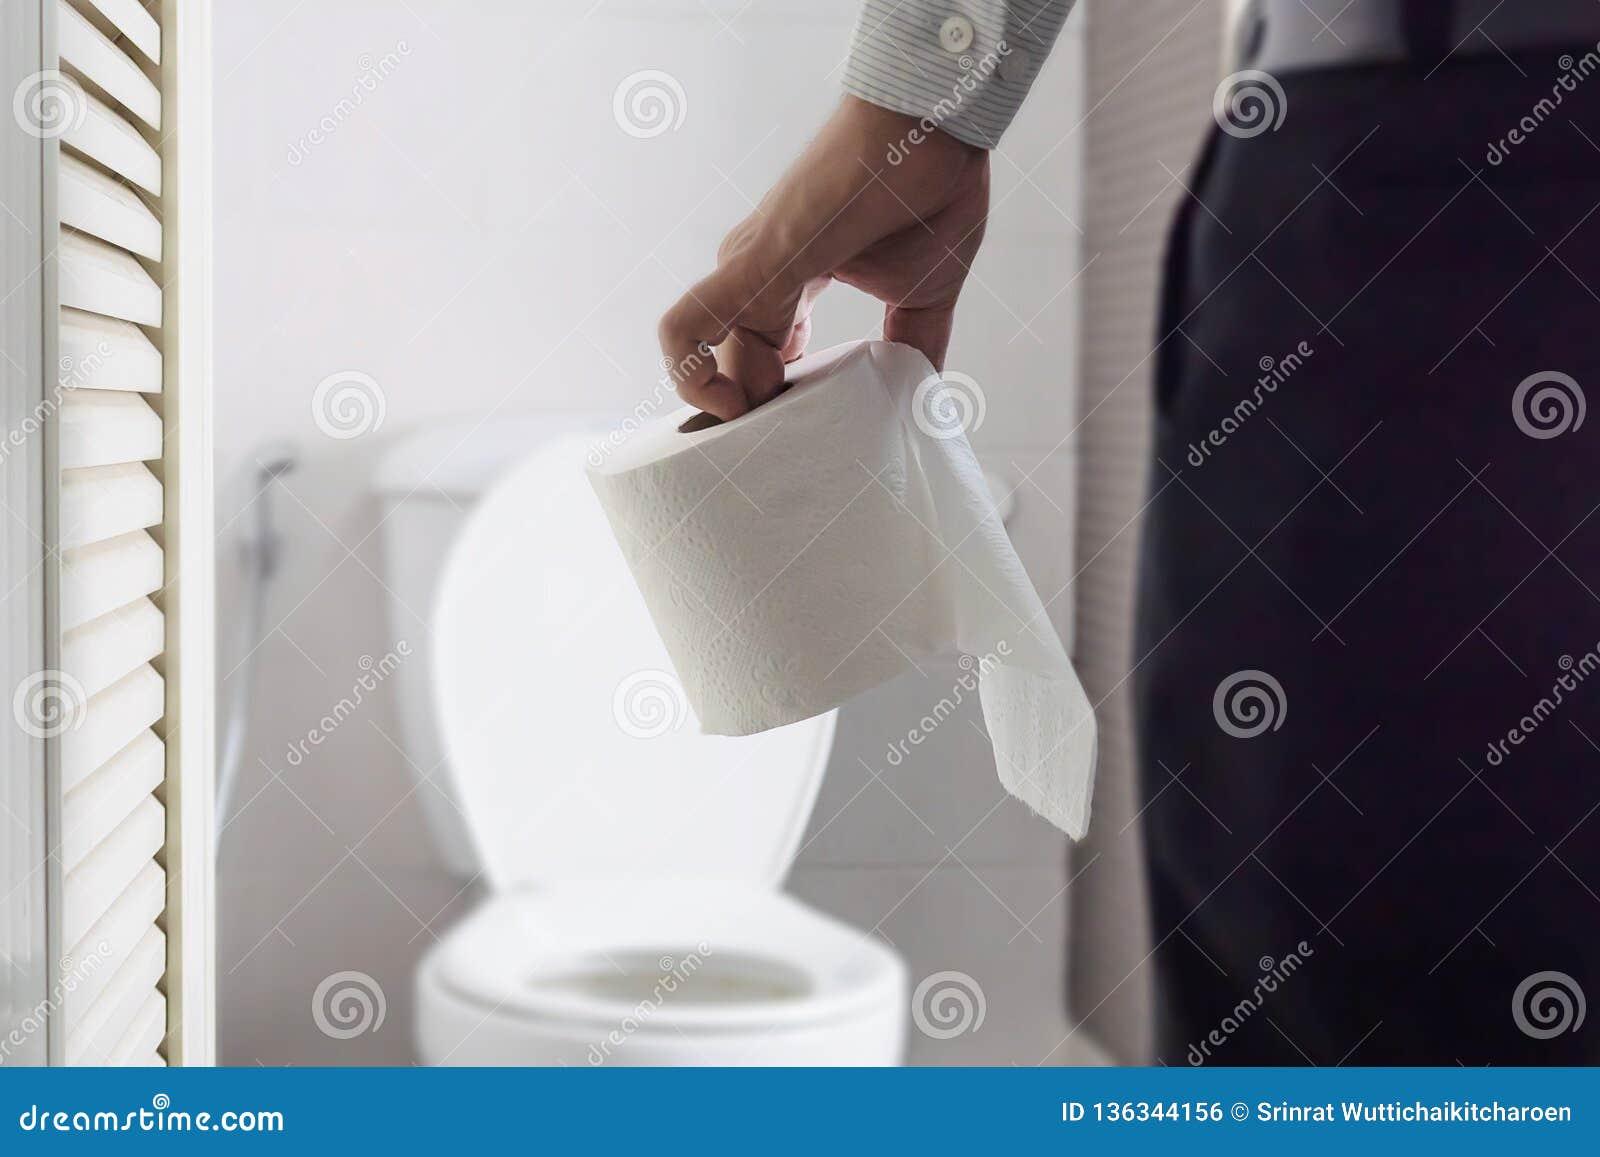 Pleasant Man Holding Tissue Paper Standing Next To Toilet Bowl Stock Creativecarmelina Interior Chair Design Creativecarmelinacom